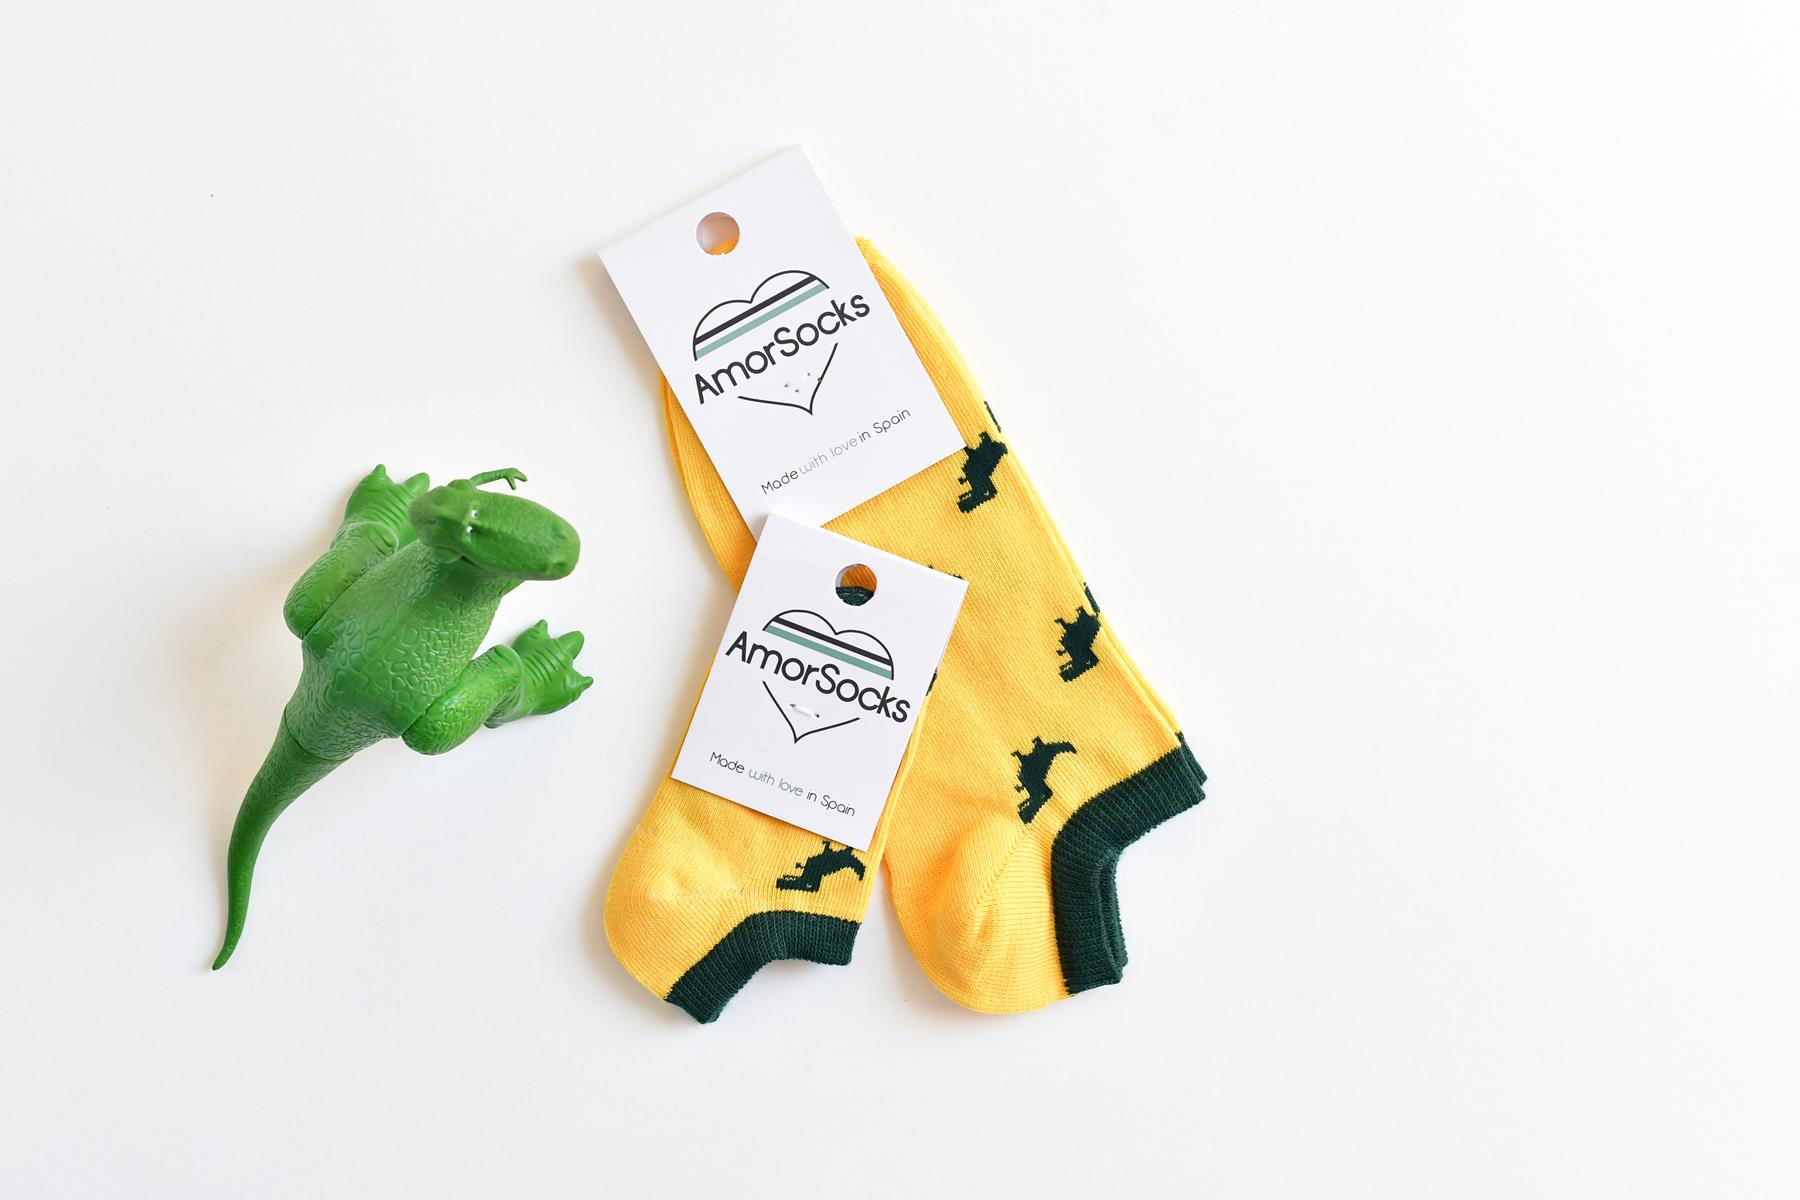 amorsocks-calcetines-socks-tobillero-invisible-dinos-dinosaurios-trex-tiranoraurio-amarillo-yellow